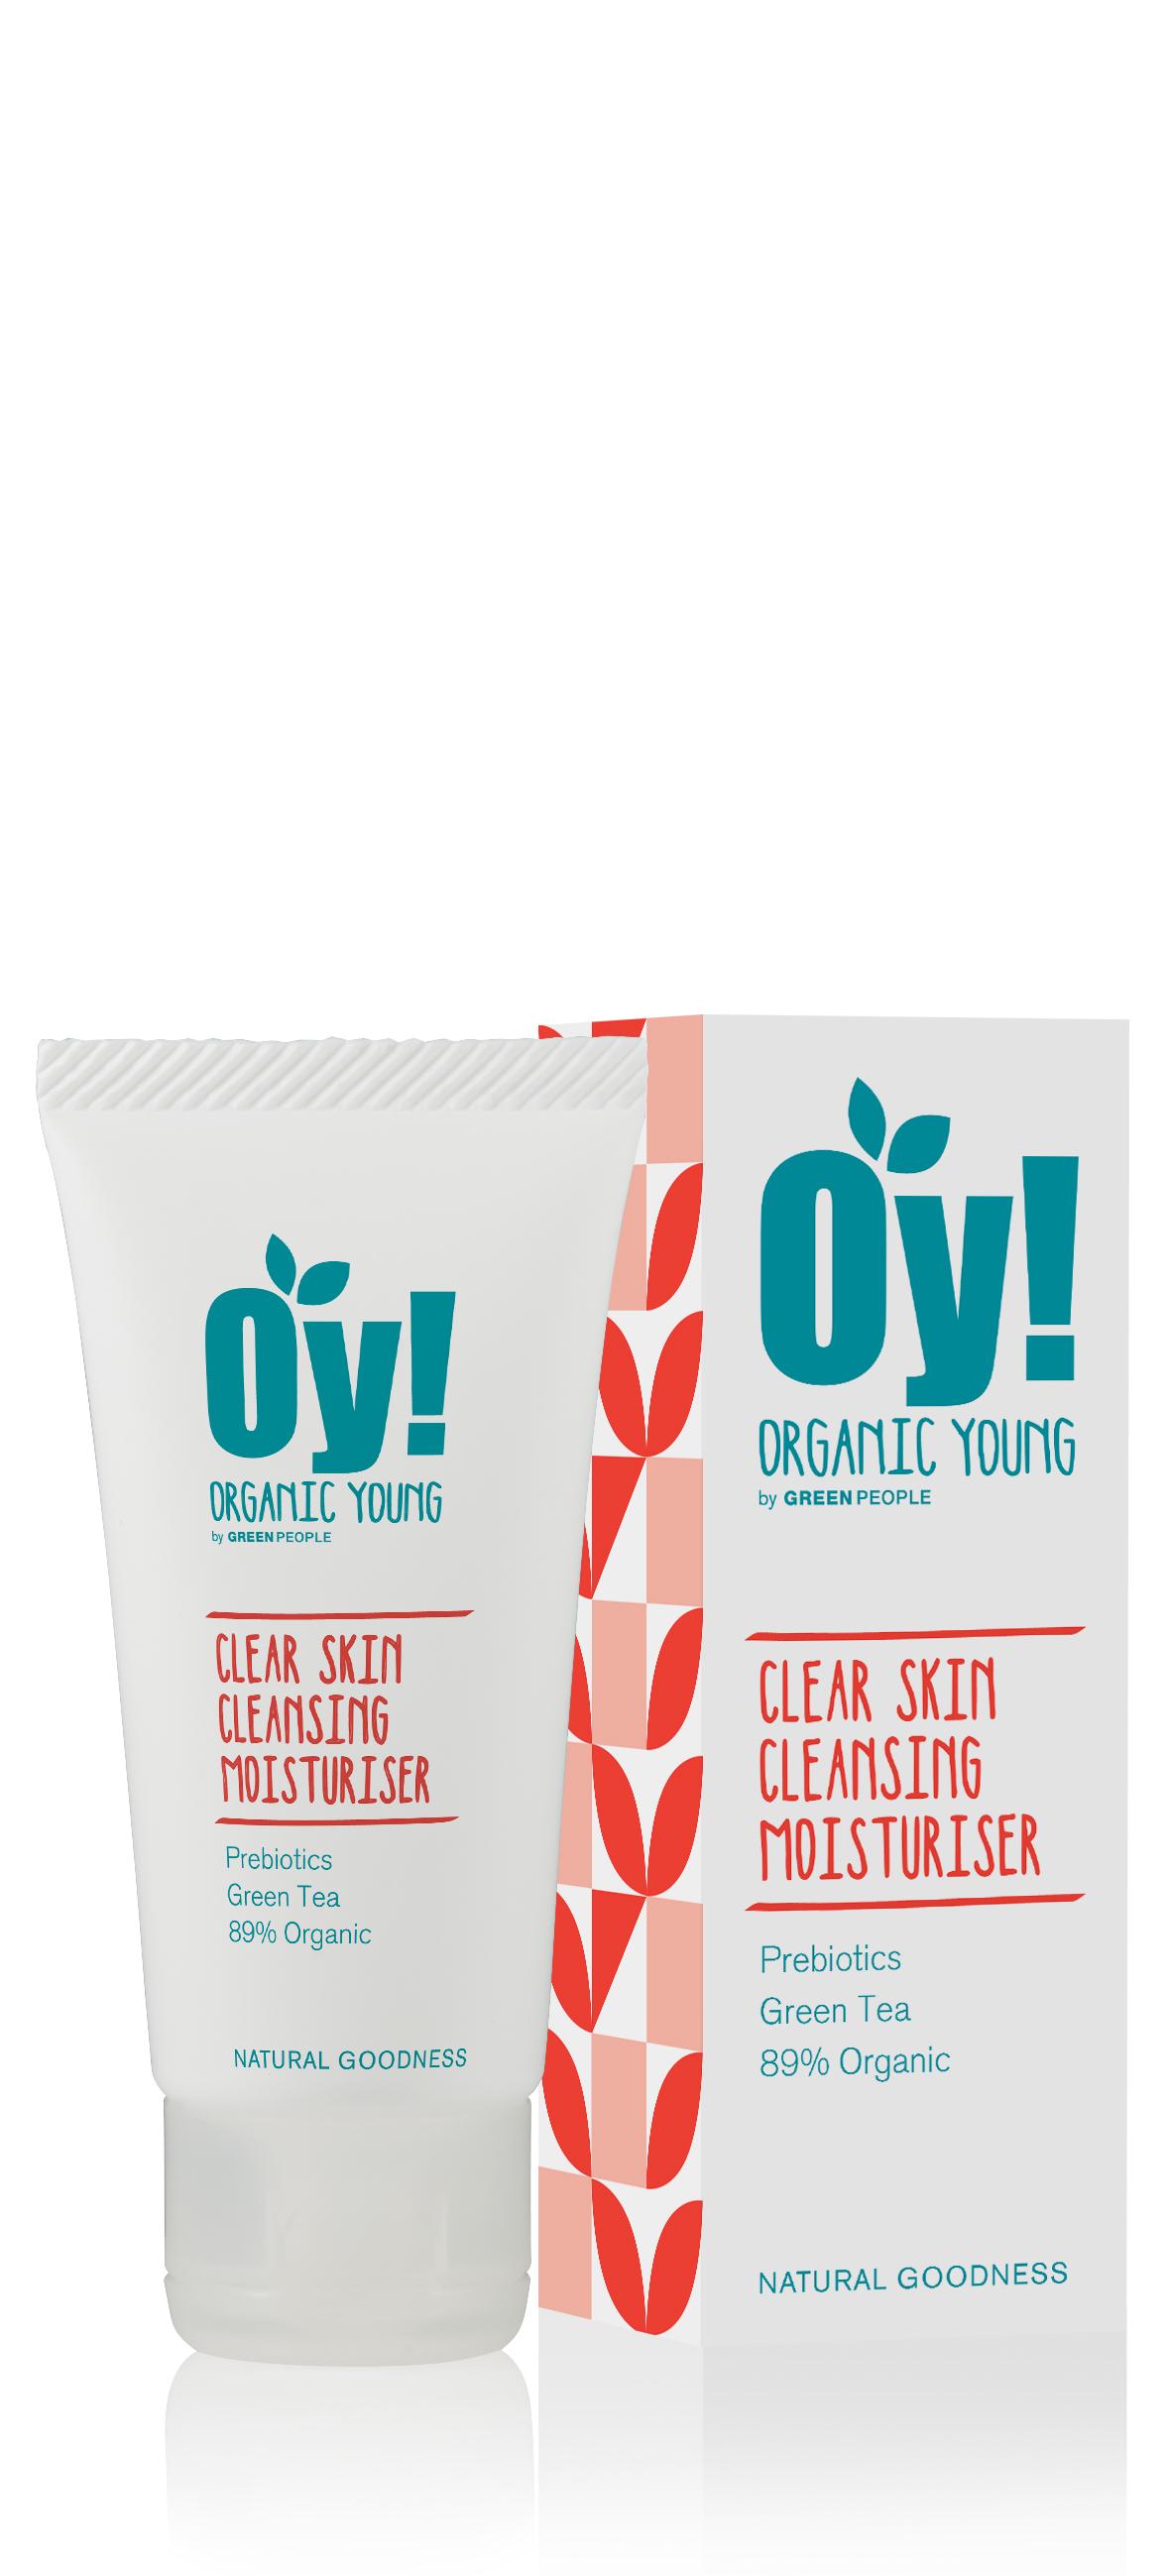 Oy! Clear Skin Cleansing Moisturiser 50ml